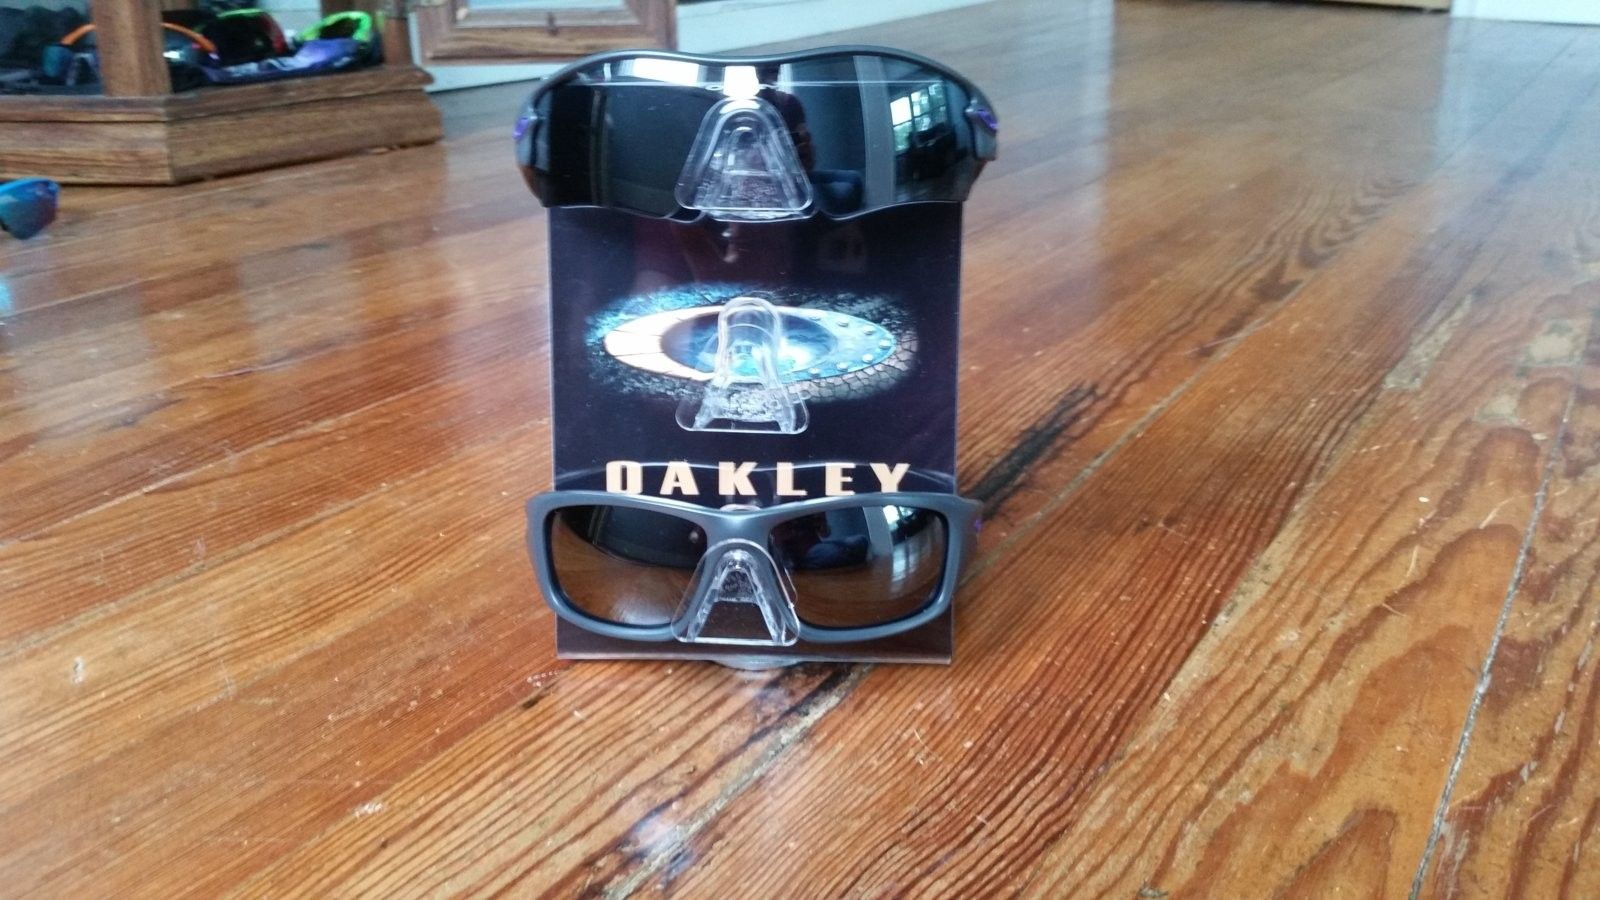 Trading few or for sale: IH Valve,IH Radar, Radarlock,Triggerman - 14754385955631816930628.jpg